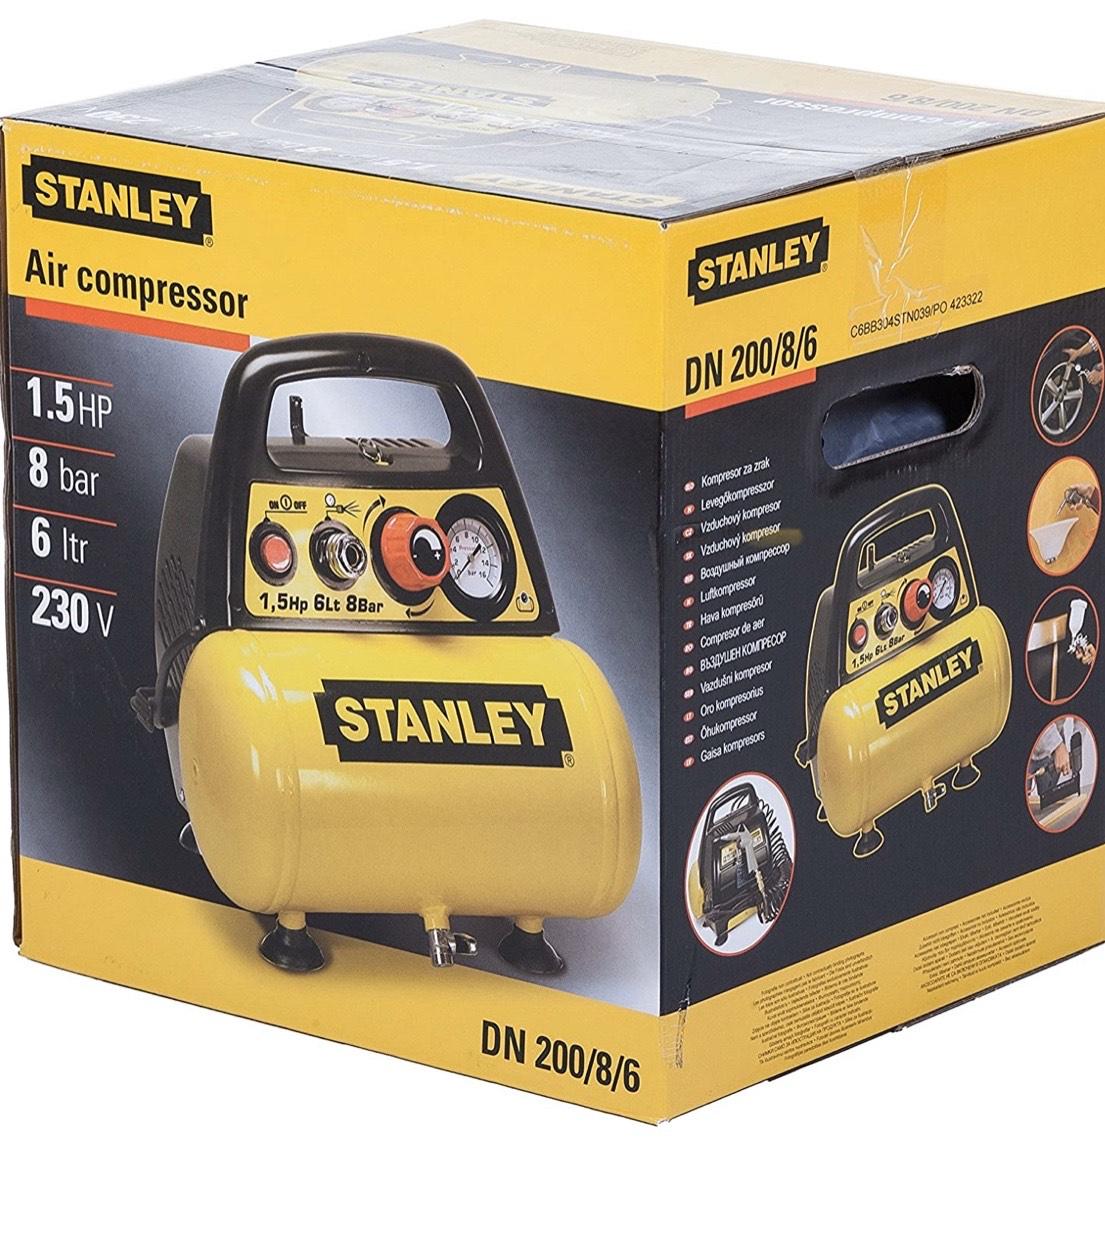 Compresor de aire Stanley 8 be